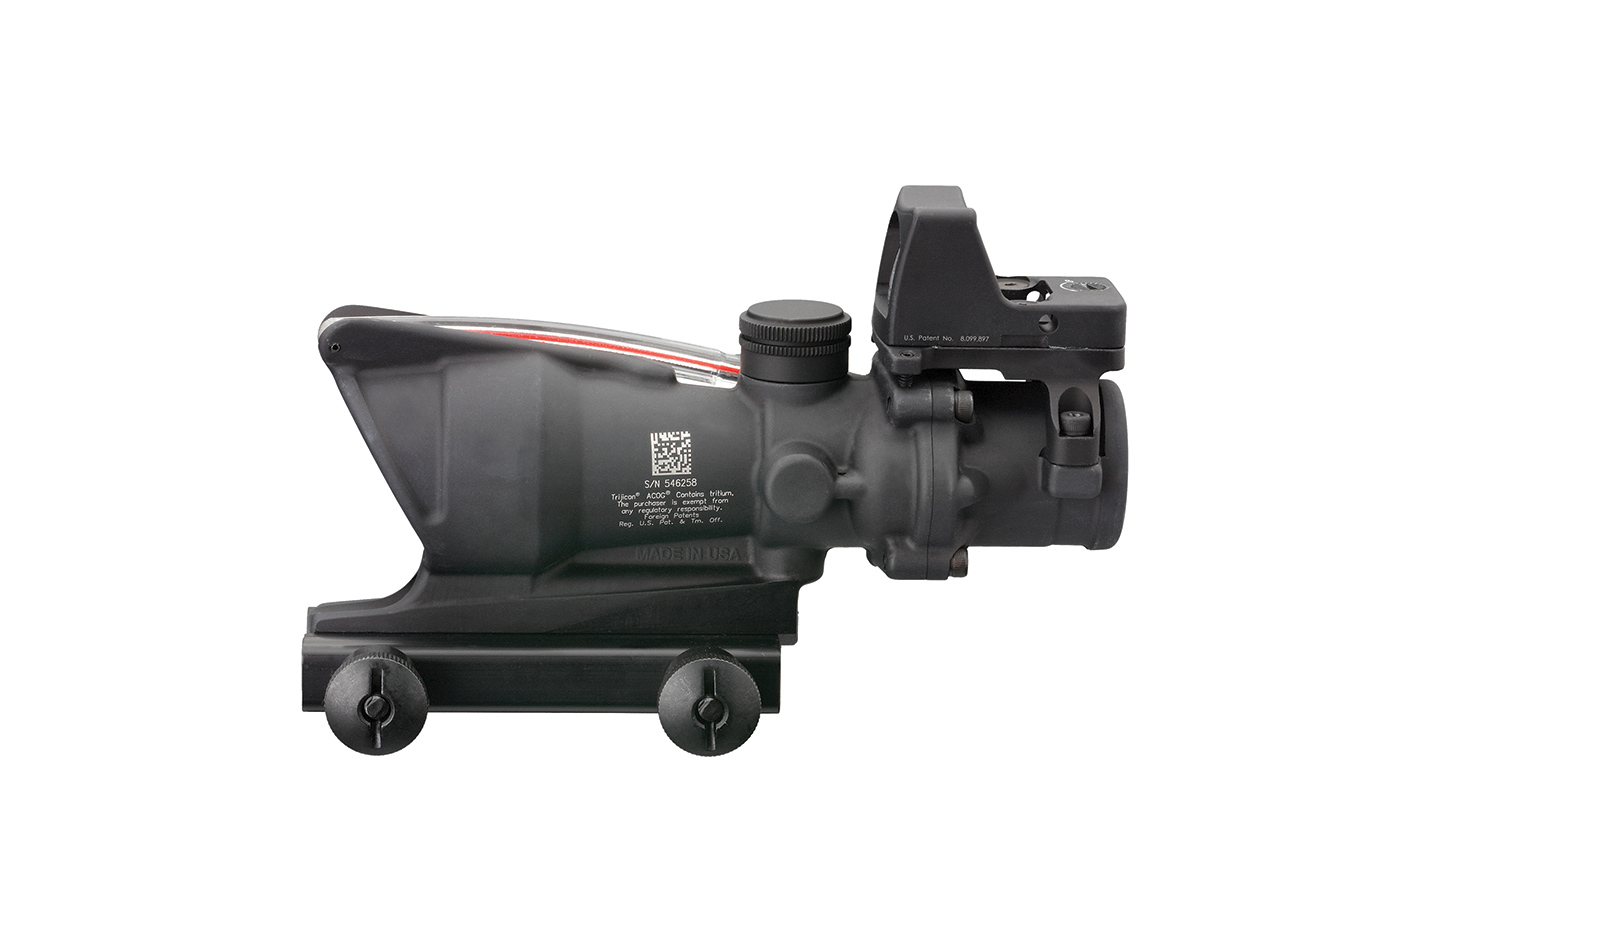 TA31-D-100549 angle 2